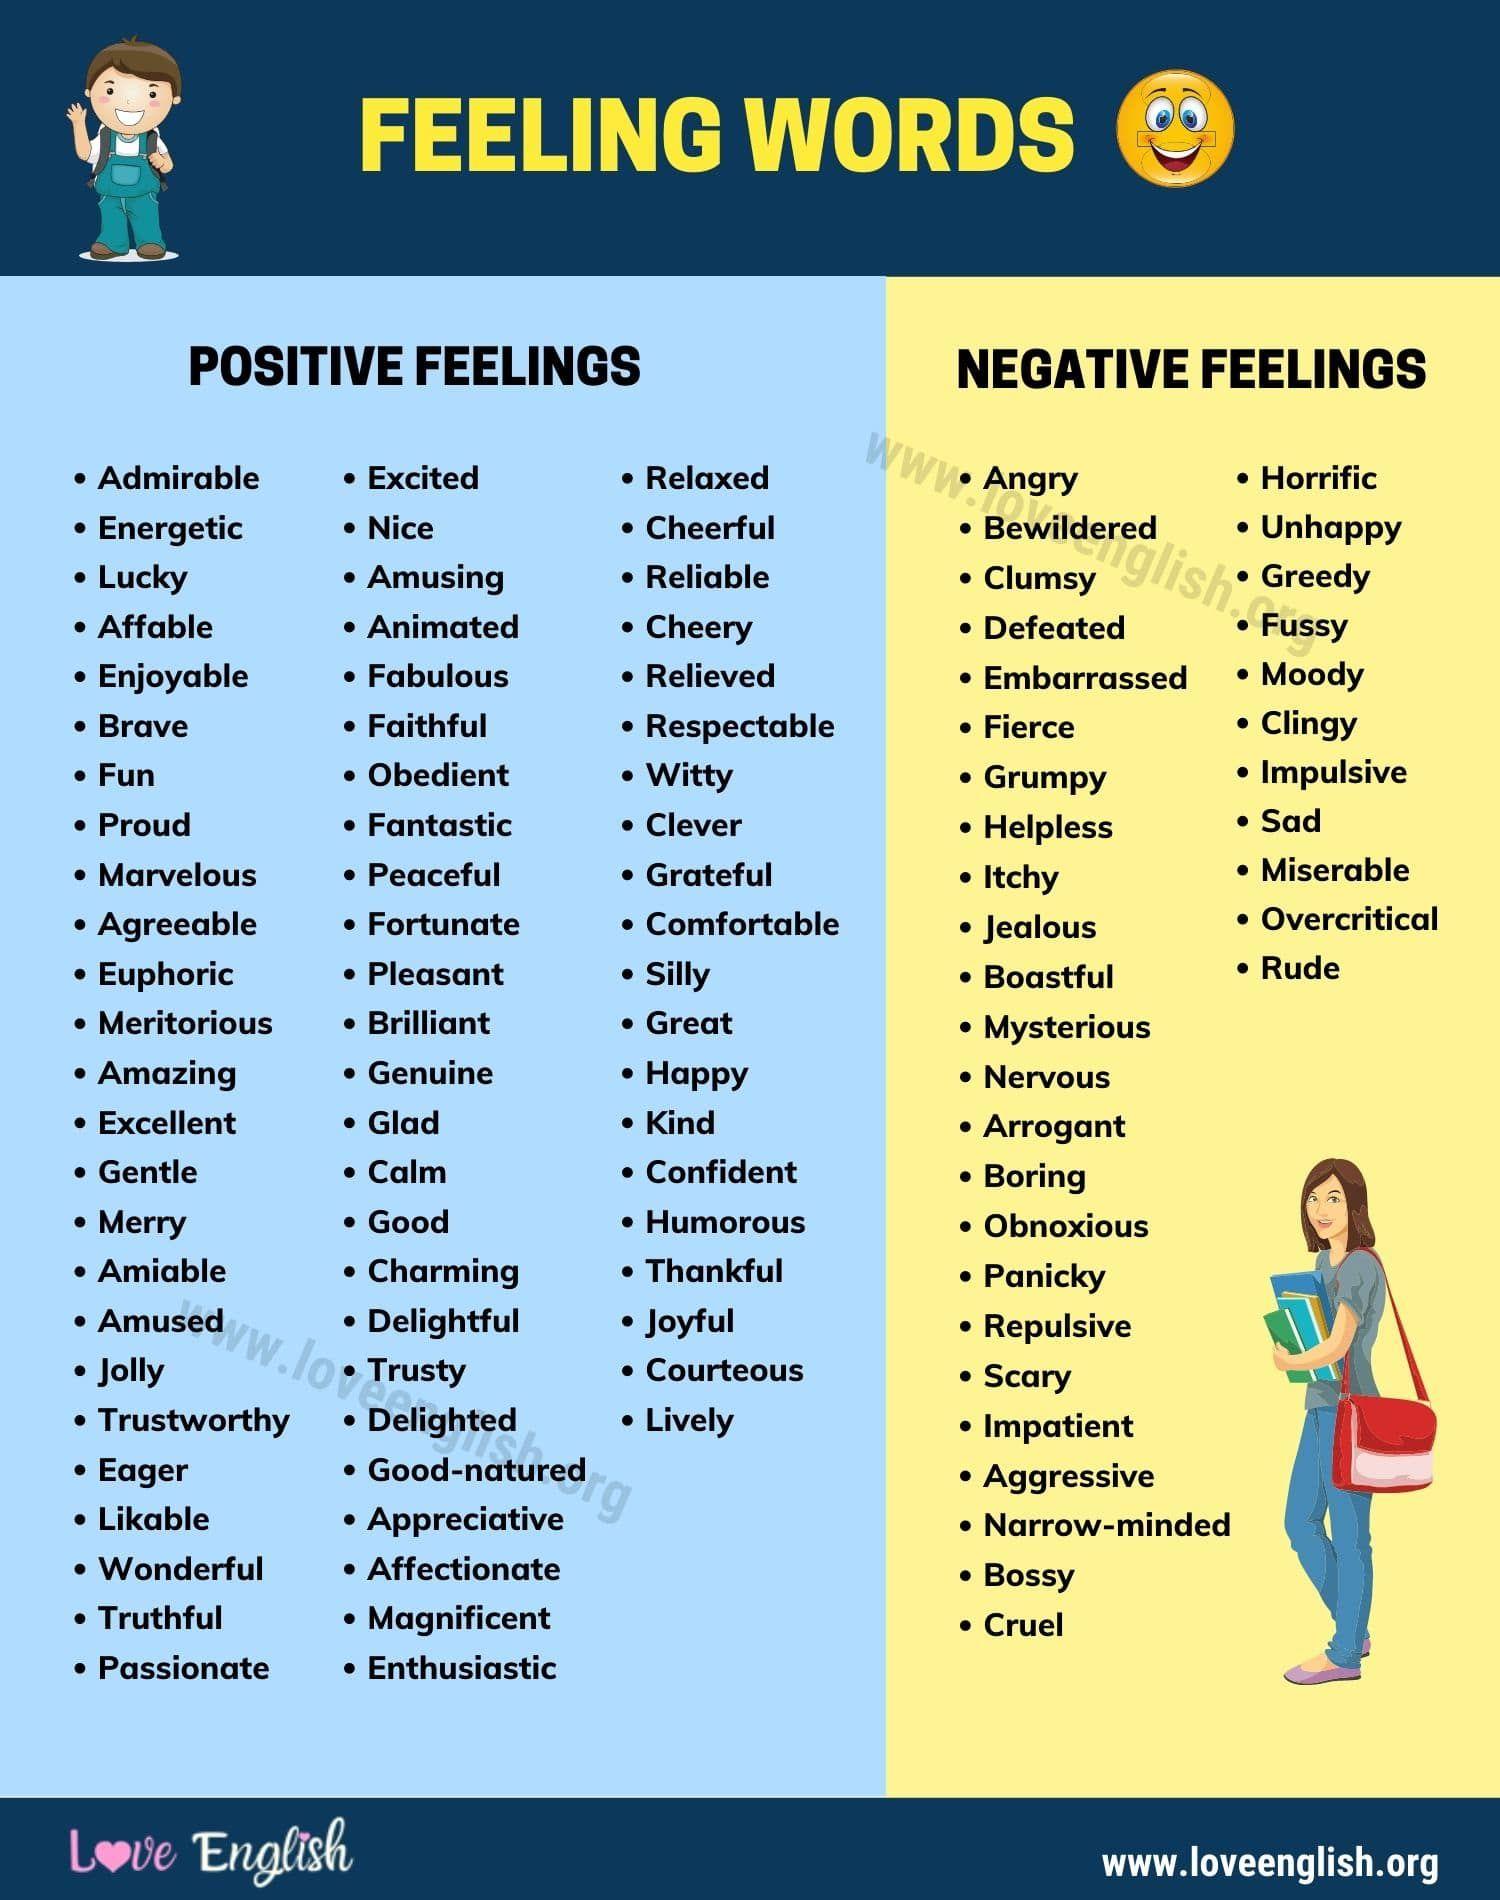 Feeling Words 100 Useful Words For Talking About Feeling Good Or Bad Love English Feelings Words Feeling Words List Emotion Words